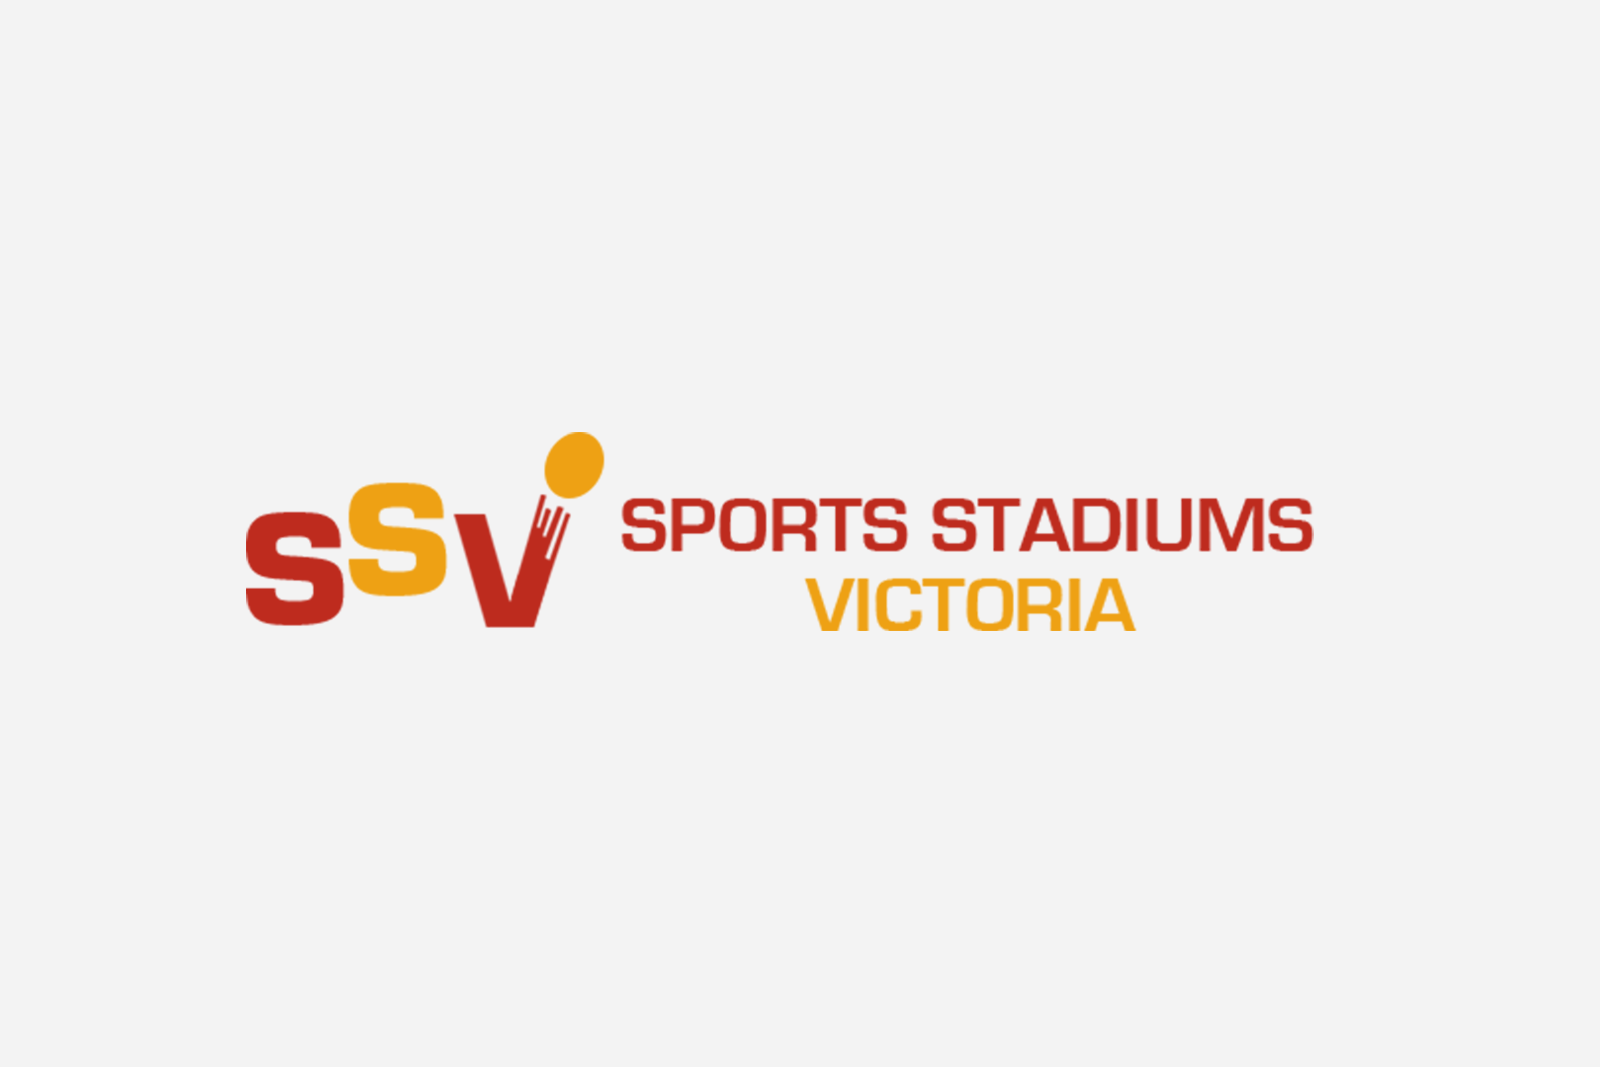 Sports Stadiums Victoria